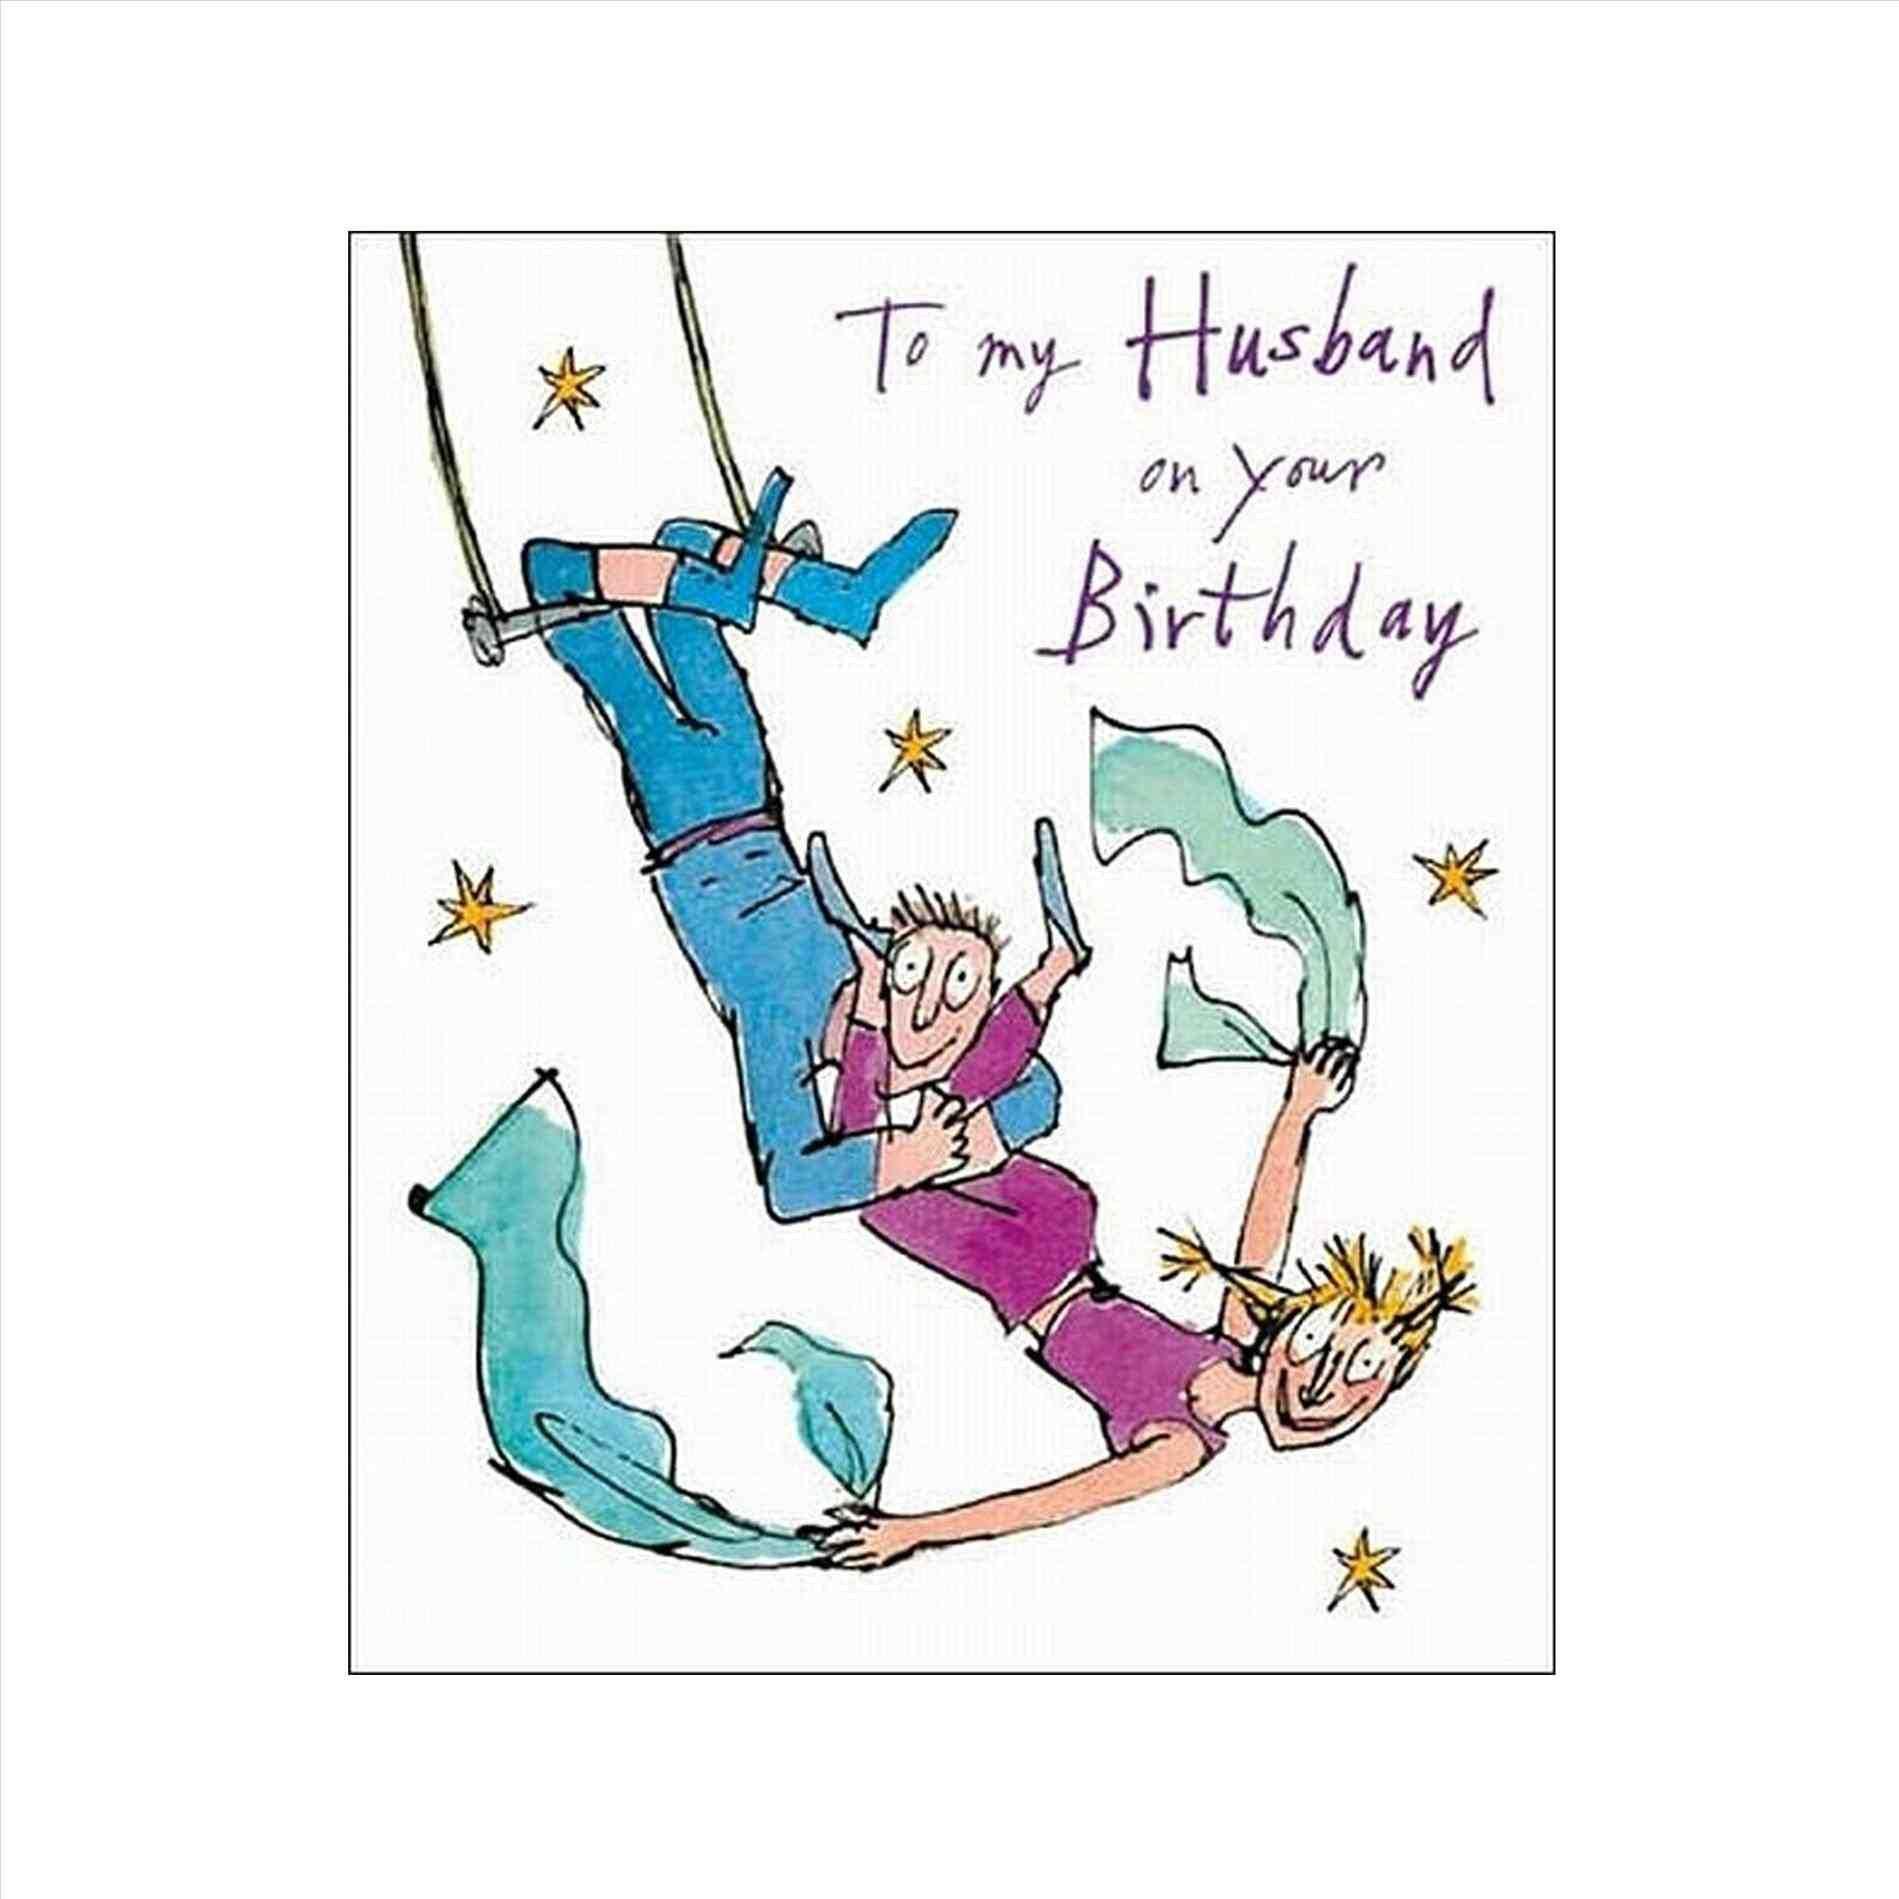 my husband's birthday card hot tub love. ecofriendly